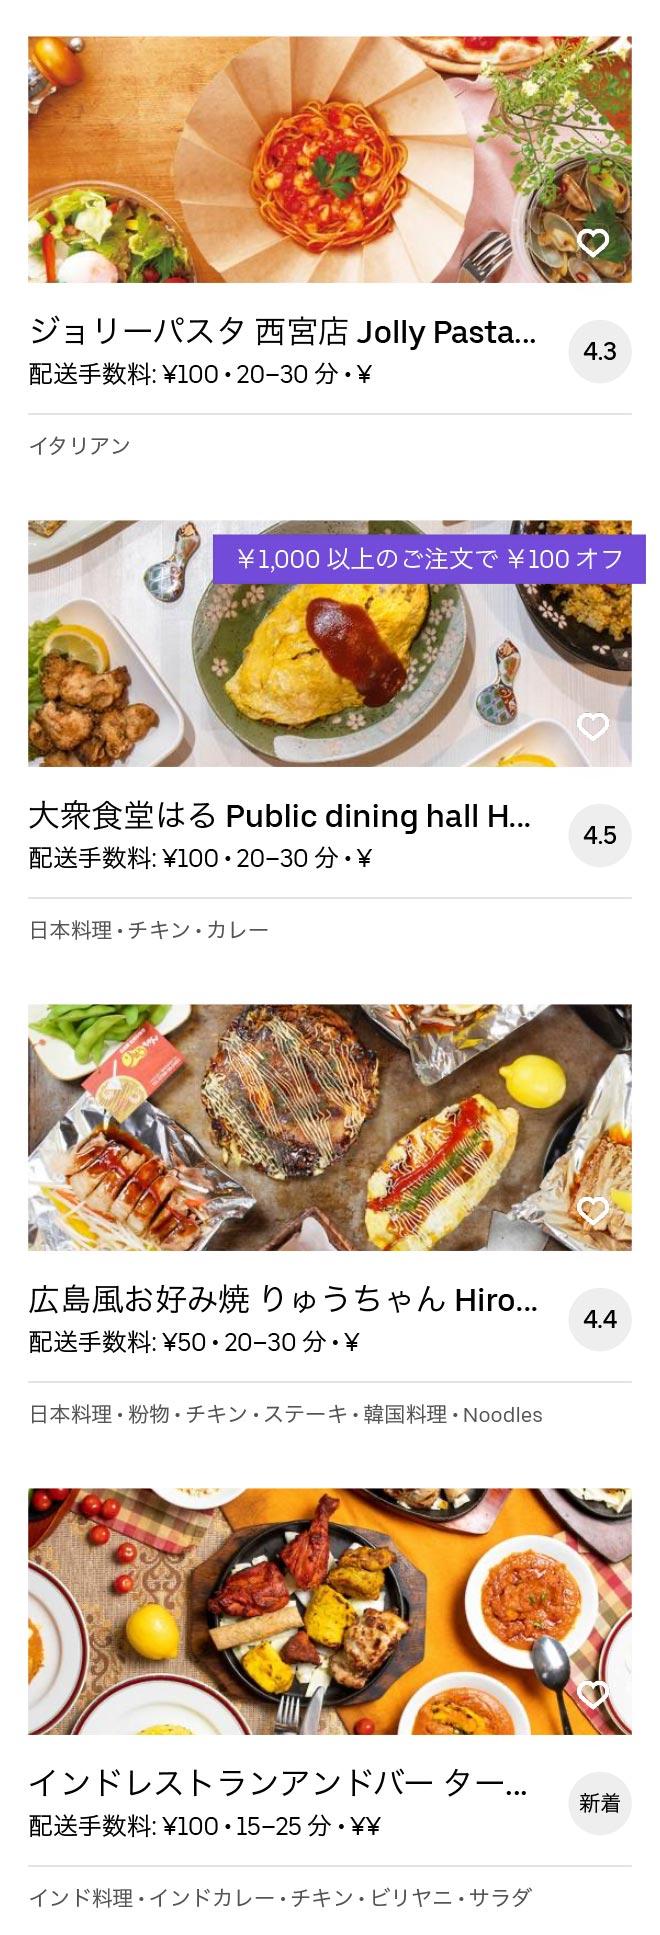 Nishinomiya hanshin menu 2005 09